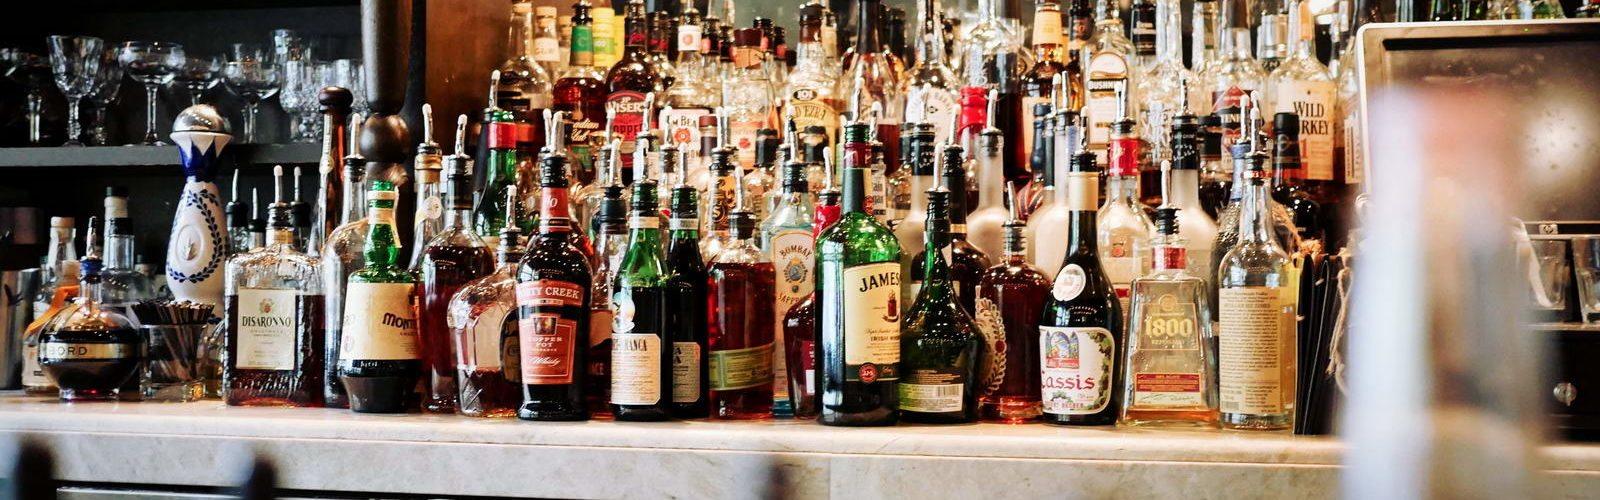 meilleurs-bars-caches-club-lounge-dallas-une2